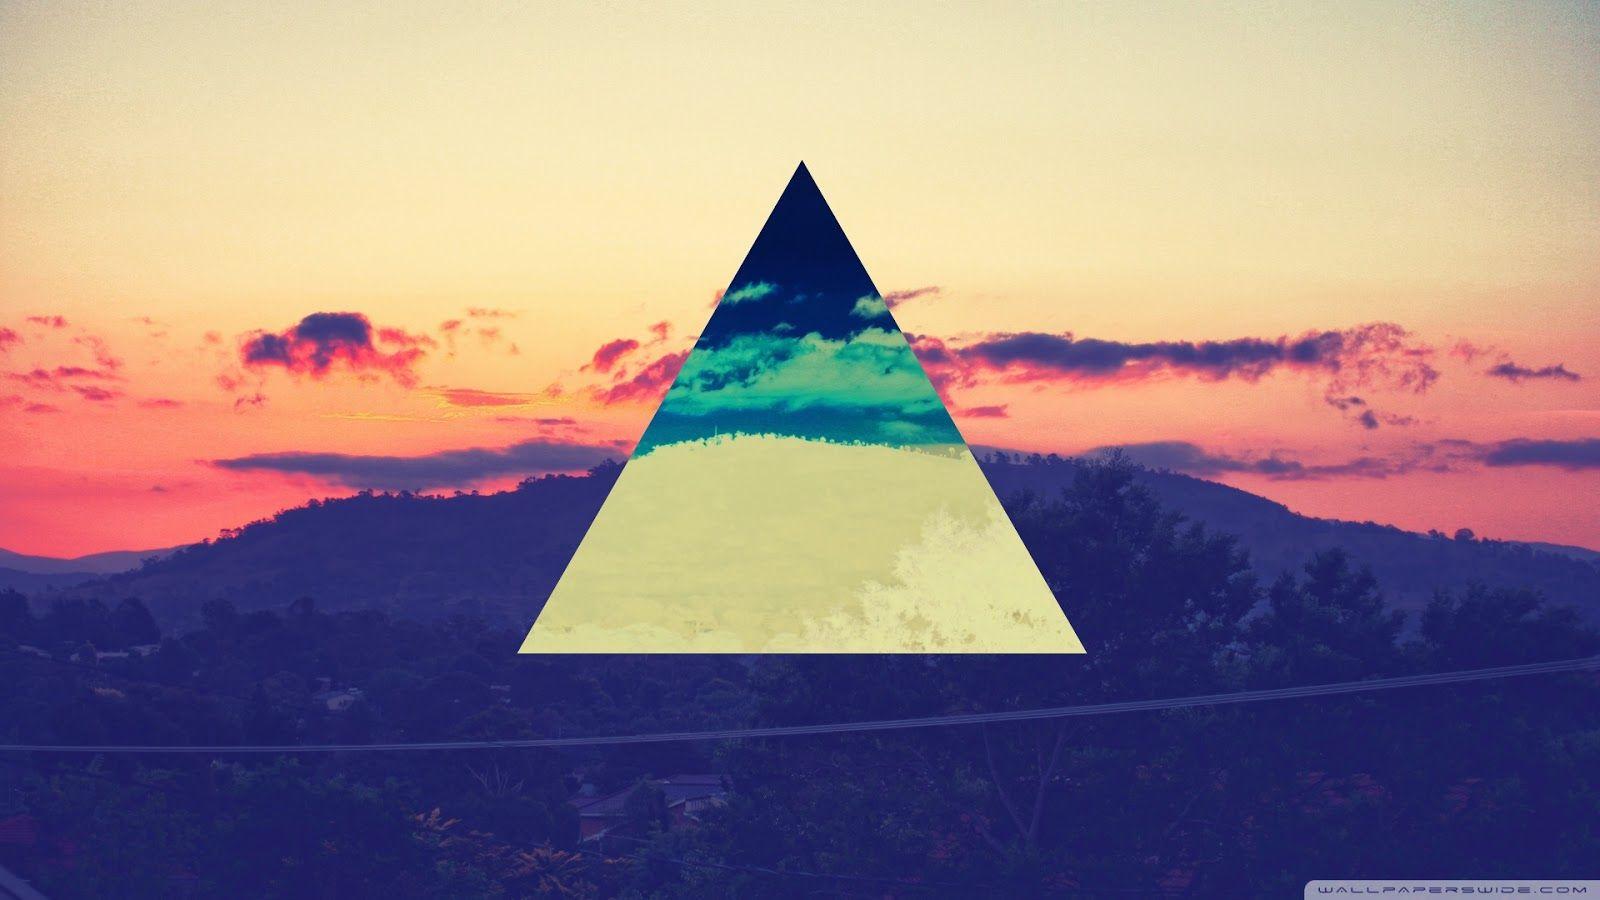 Triangle Fondos De Pantalla Hipster Wallpaper Wallpaper